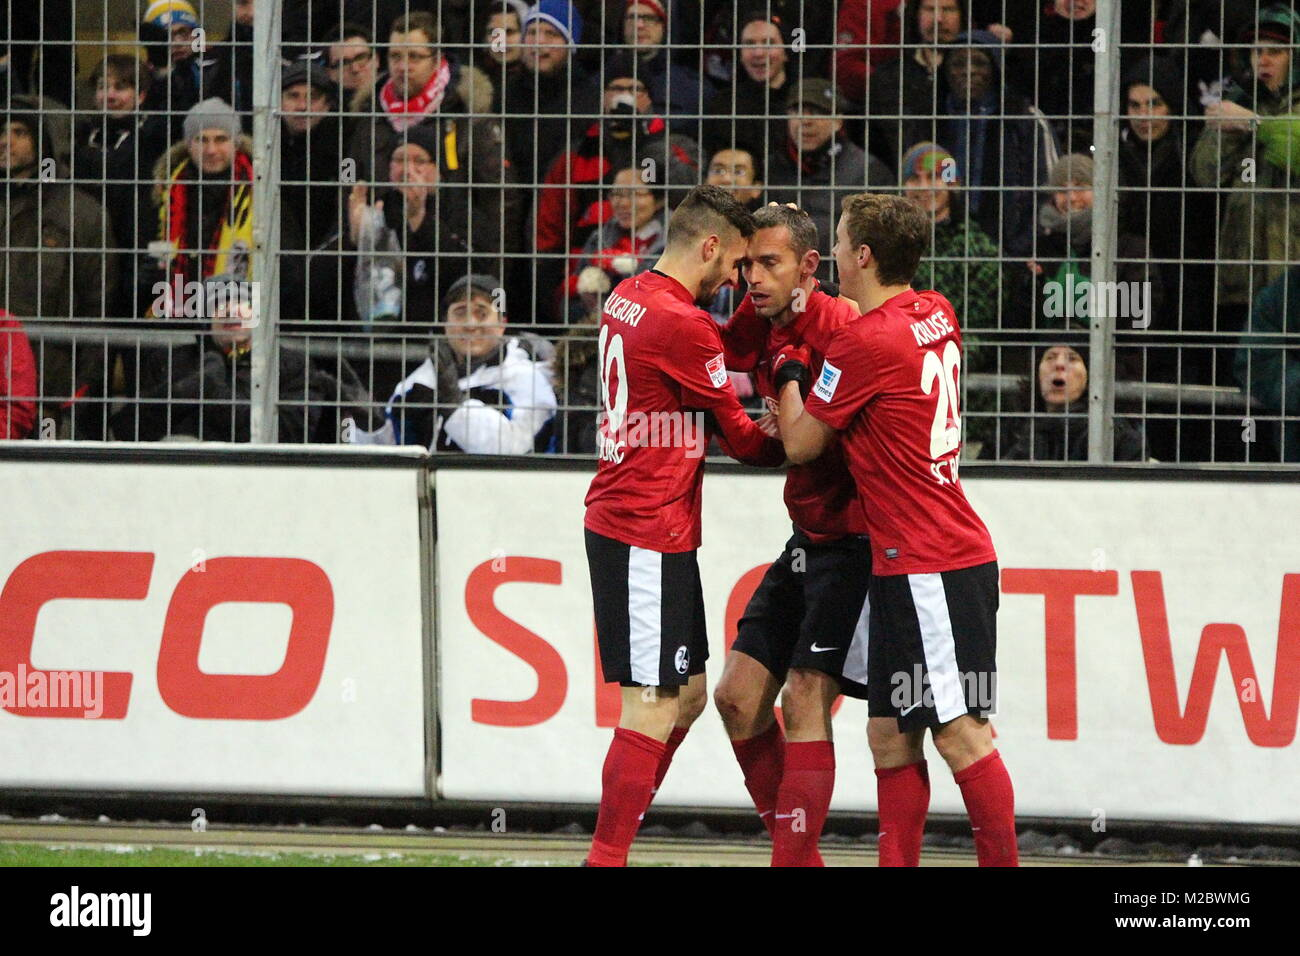 Fußball-Bundesliga - Stock Image